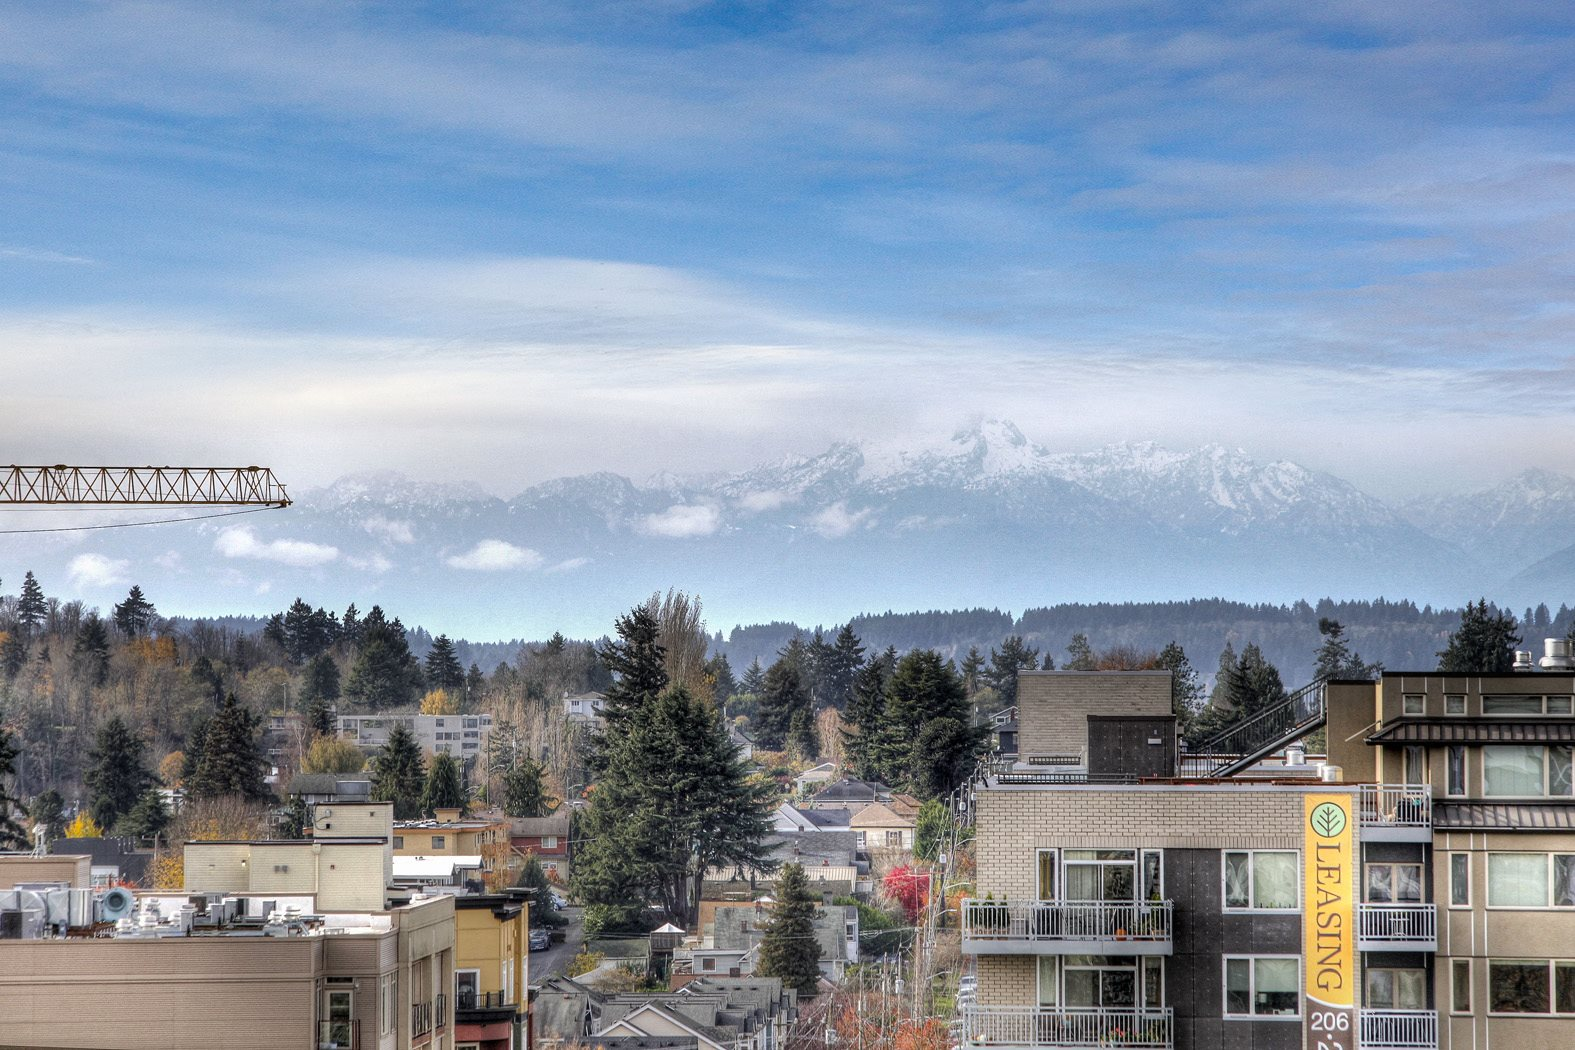 Seattle photogallery 27